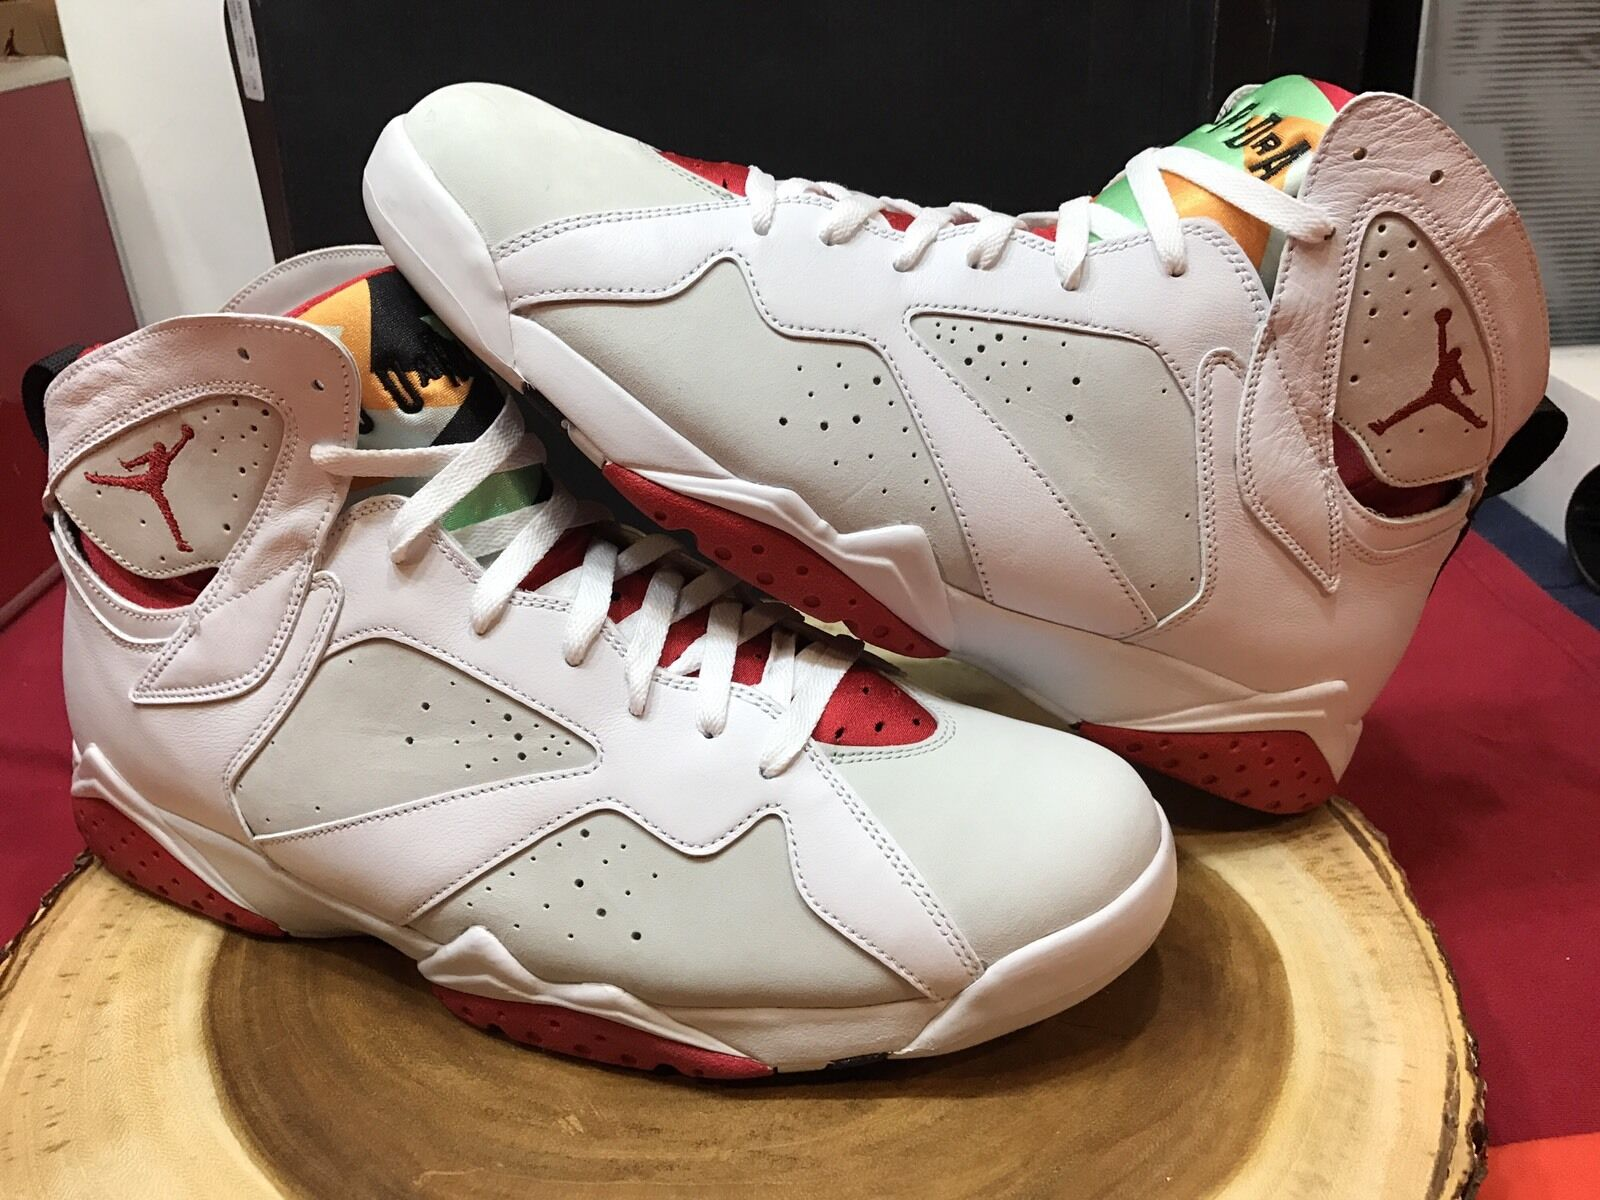 Nike Air Jordan Retro VII Hare Bugs Bunny Size 15 VI IV V VIII Carmine Alternate